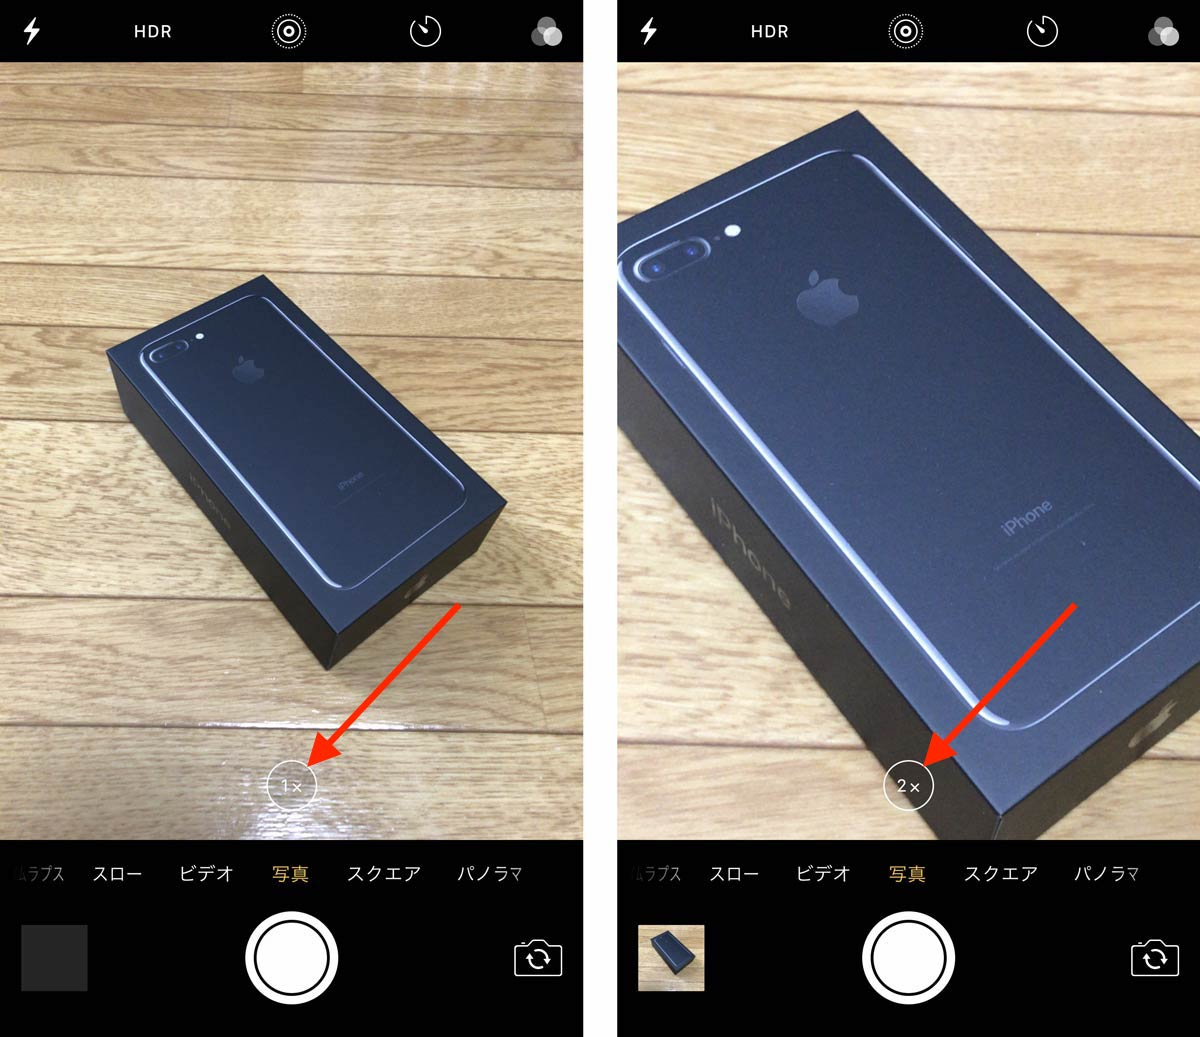 iPhone7 Plus ズーム機能